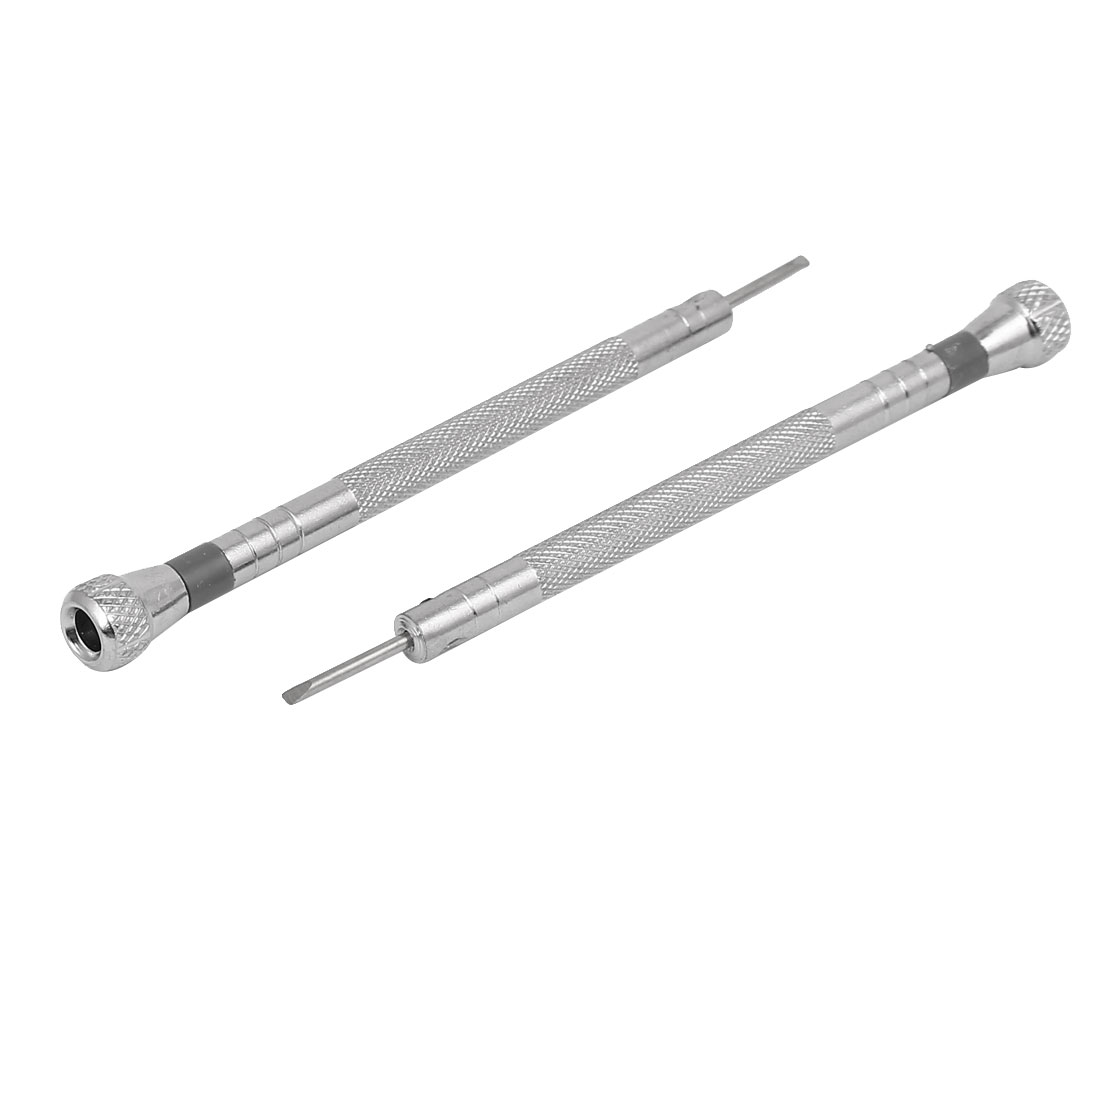 91mm Long 1.4mm Width Flat Blade Slotted Screwdriver Watch Repairing Tool 2pcs